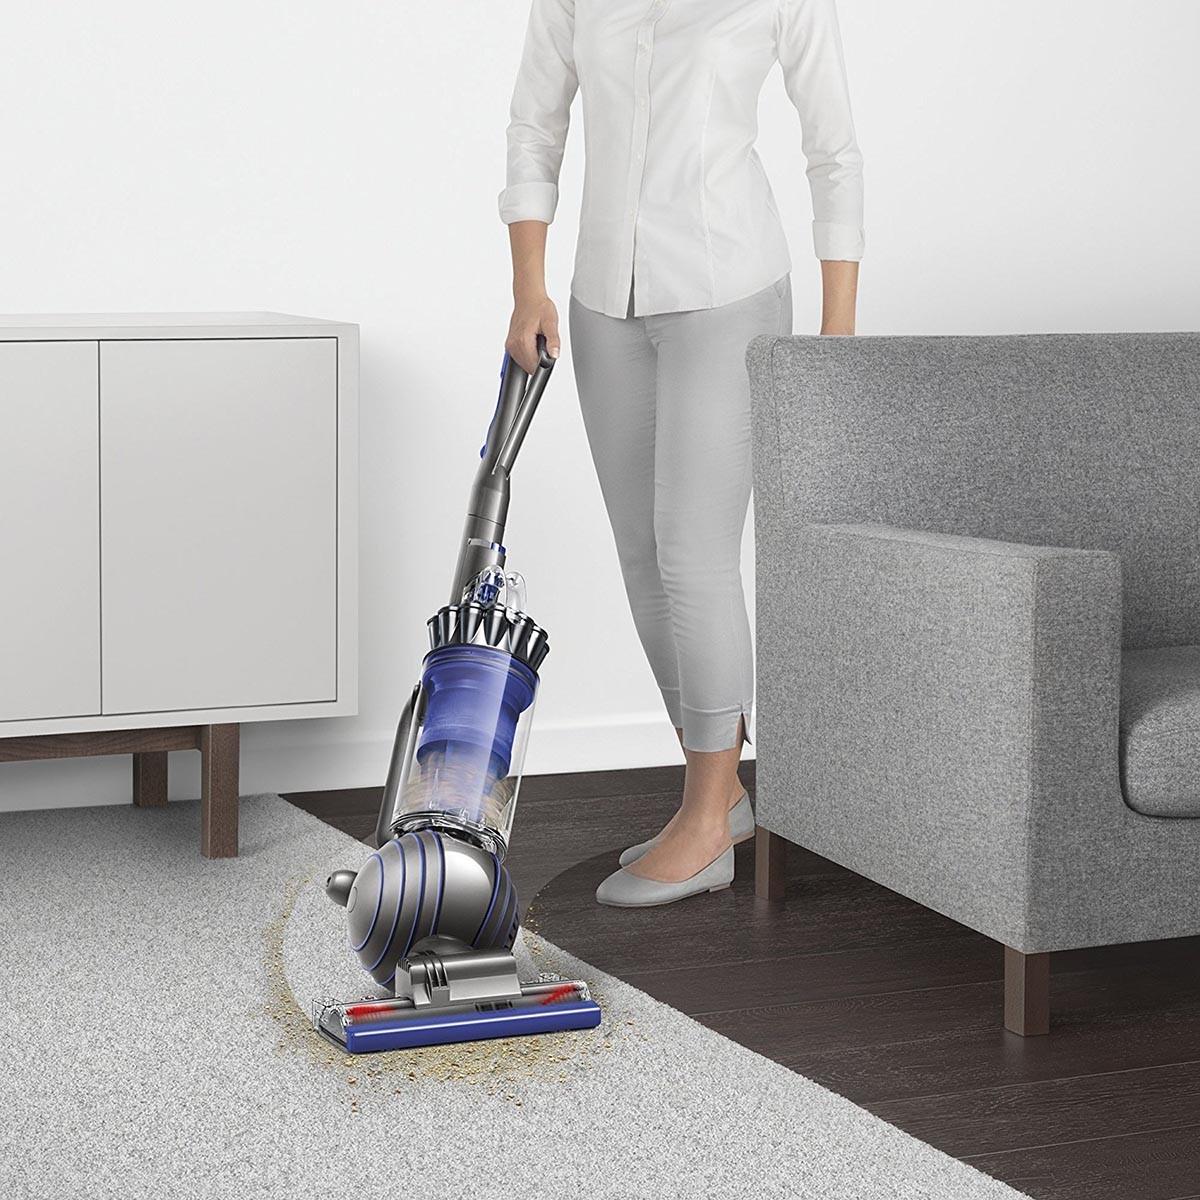 Best dyson vacuum cleaners for pet hair пылесосы дайсон с аквафильтром отзывы